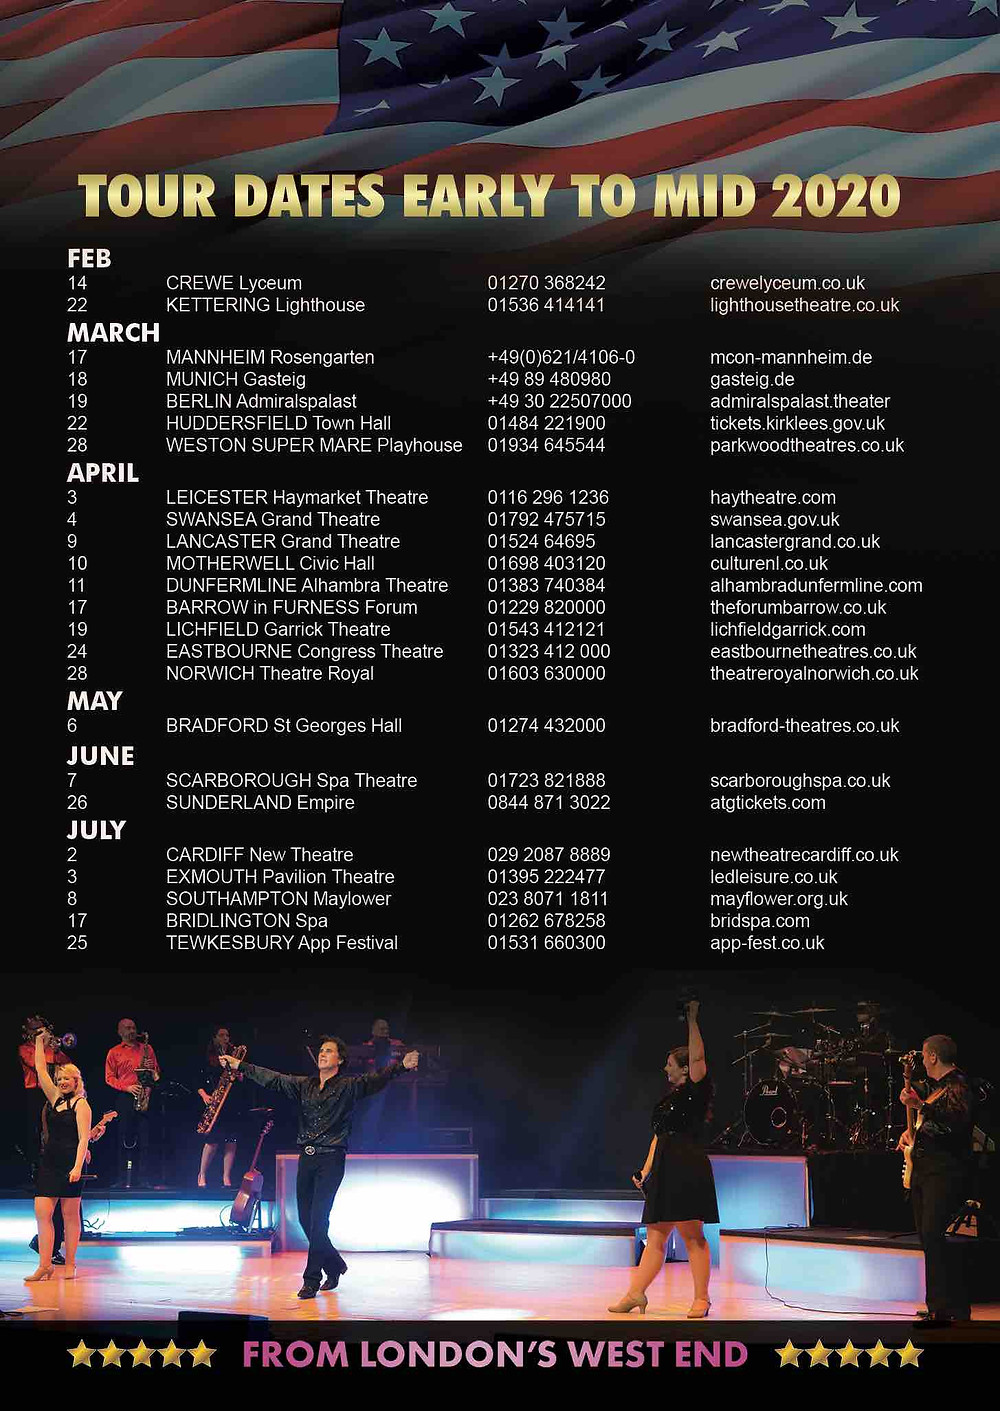 tour dates for A Beautiful noise show neil diamond tribute